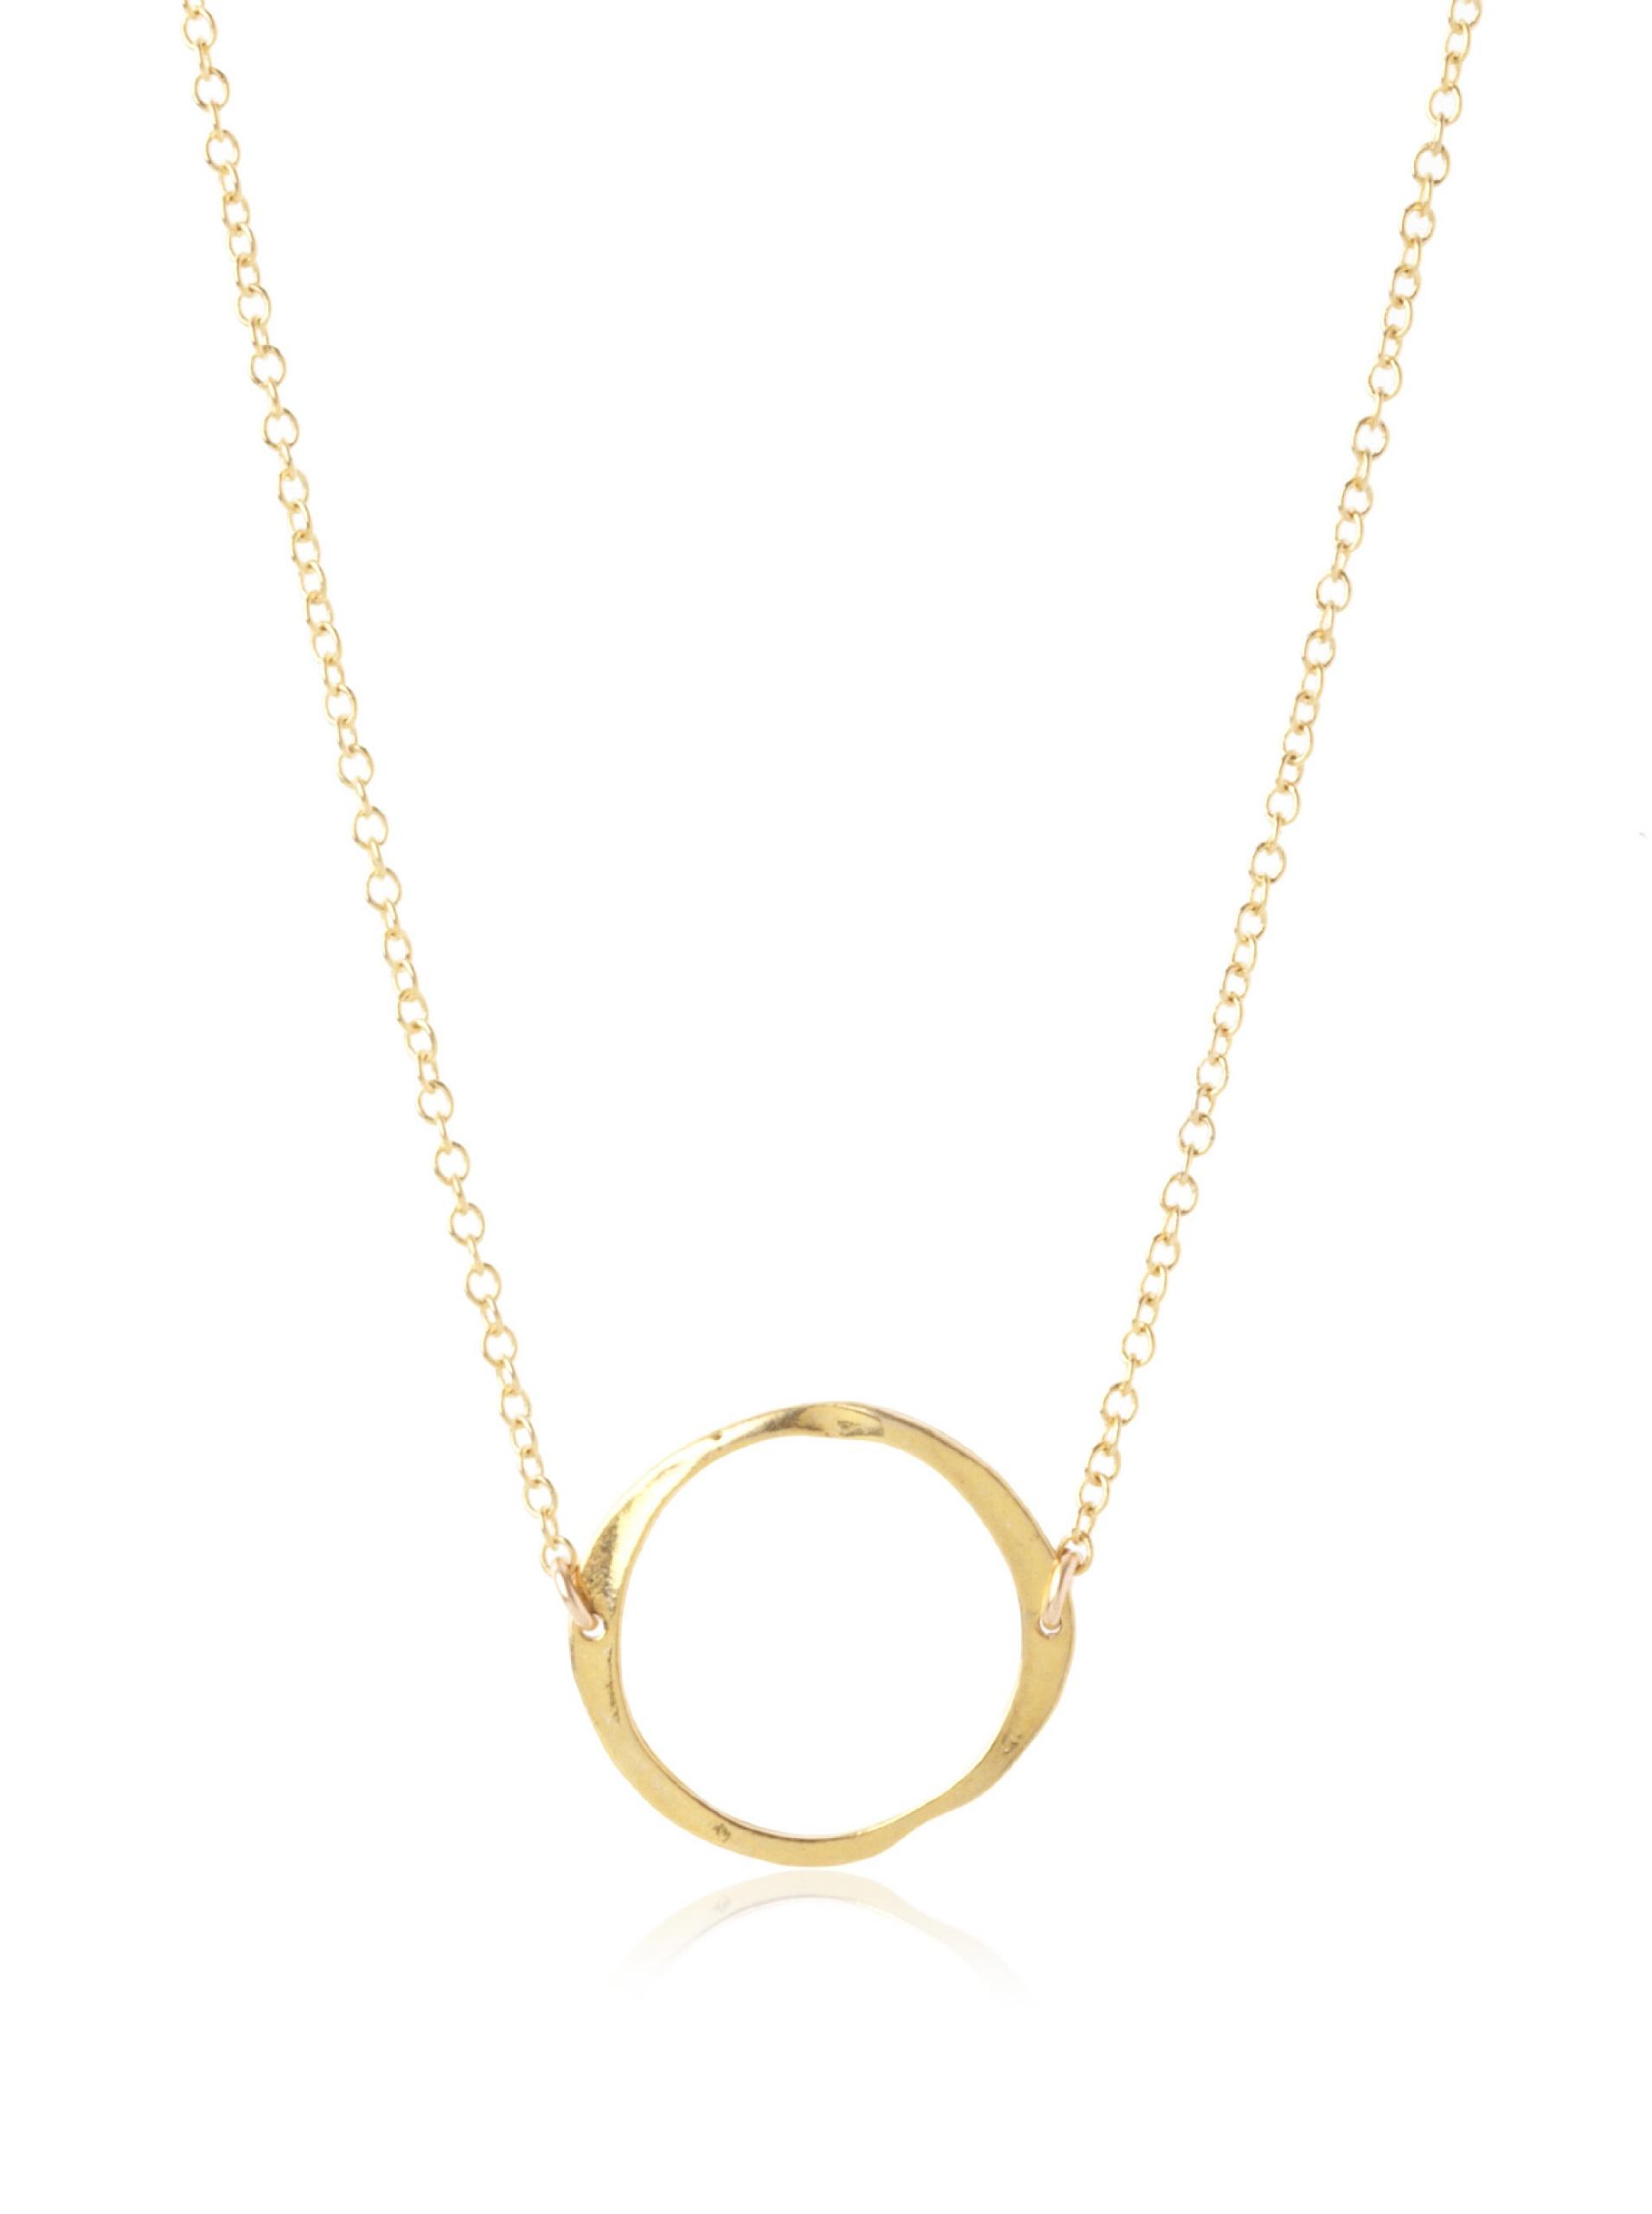 gorjana Circle Necklace, Gold